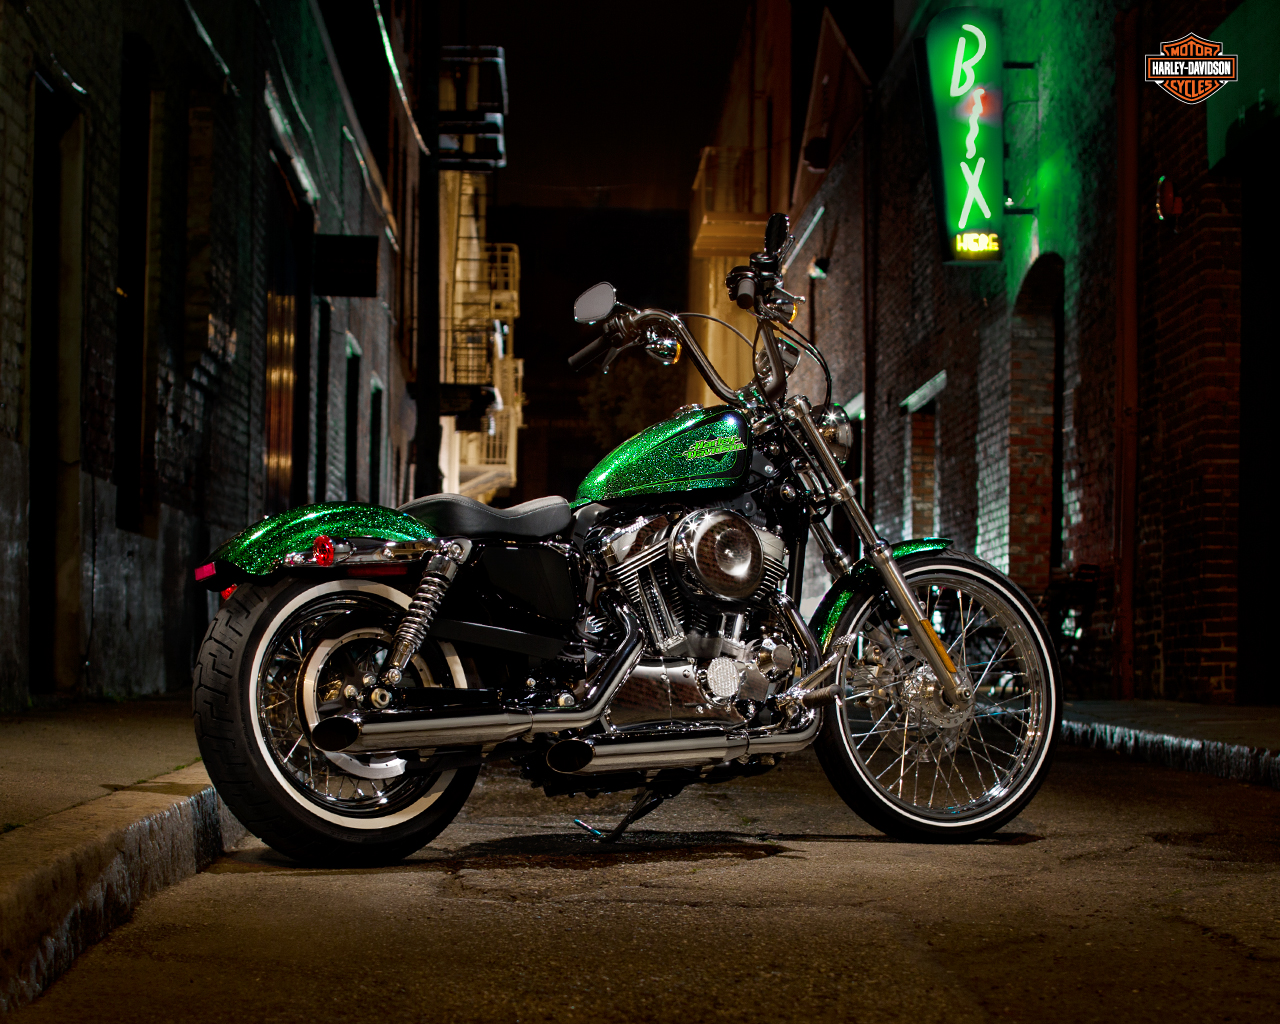 Harley Davidson Seventy Two Sportster 2013 Motorcycles Photos Wallpaper HD